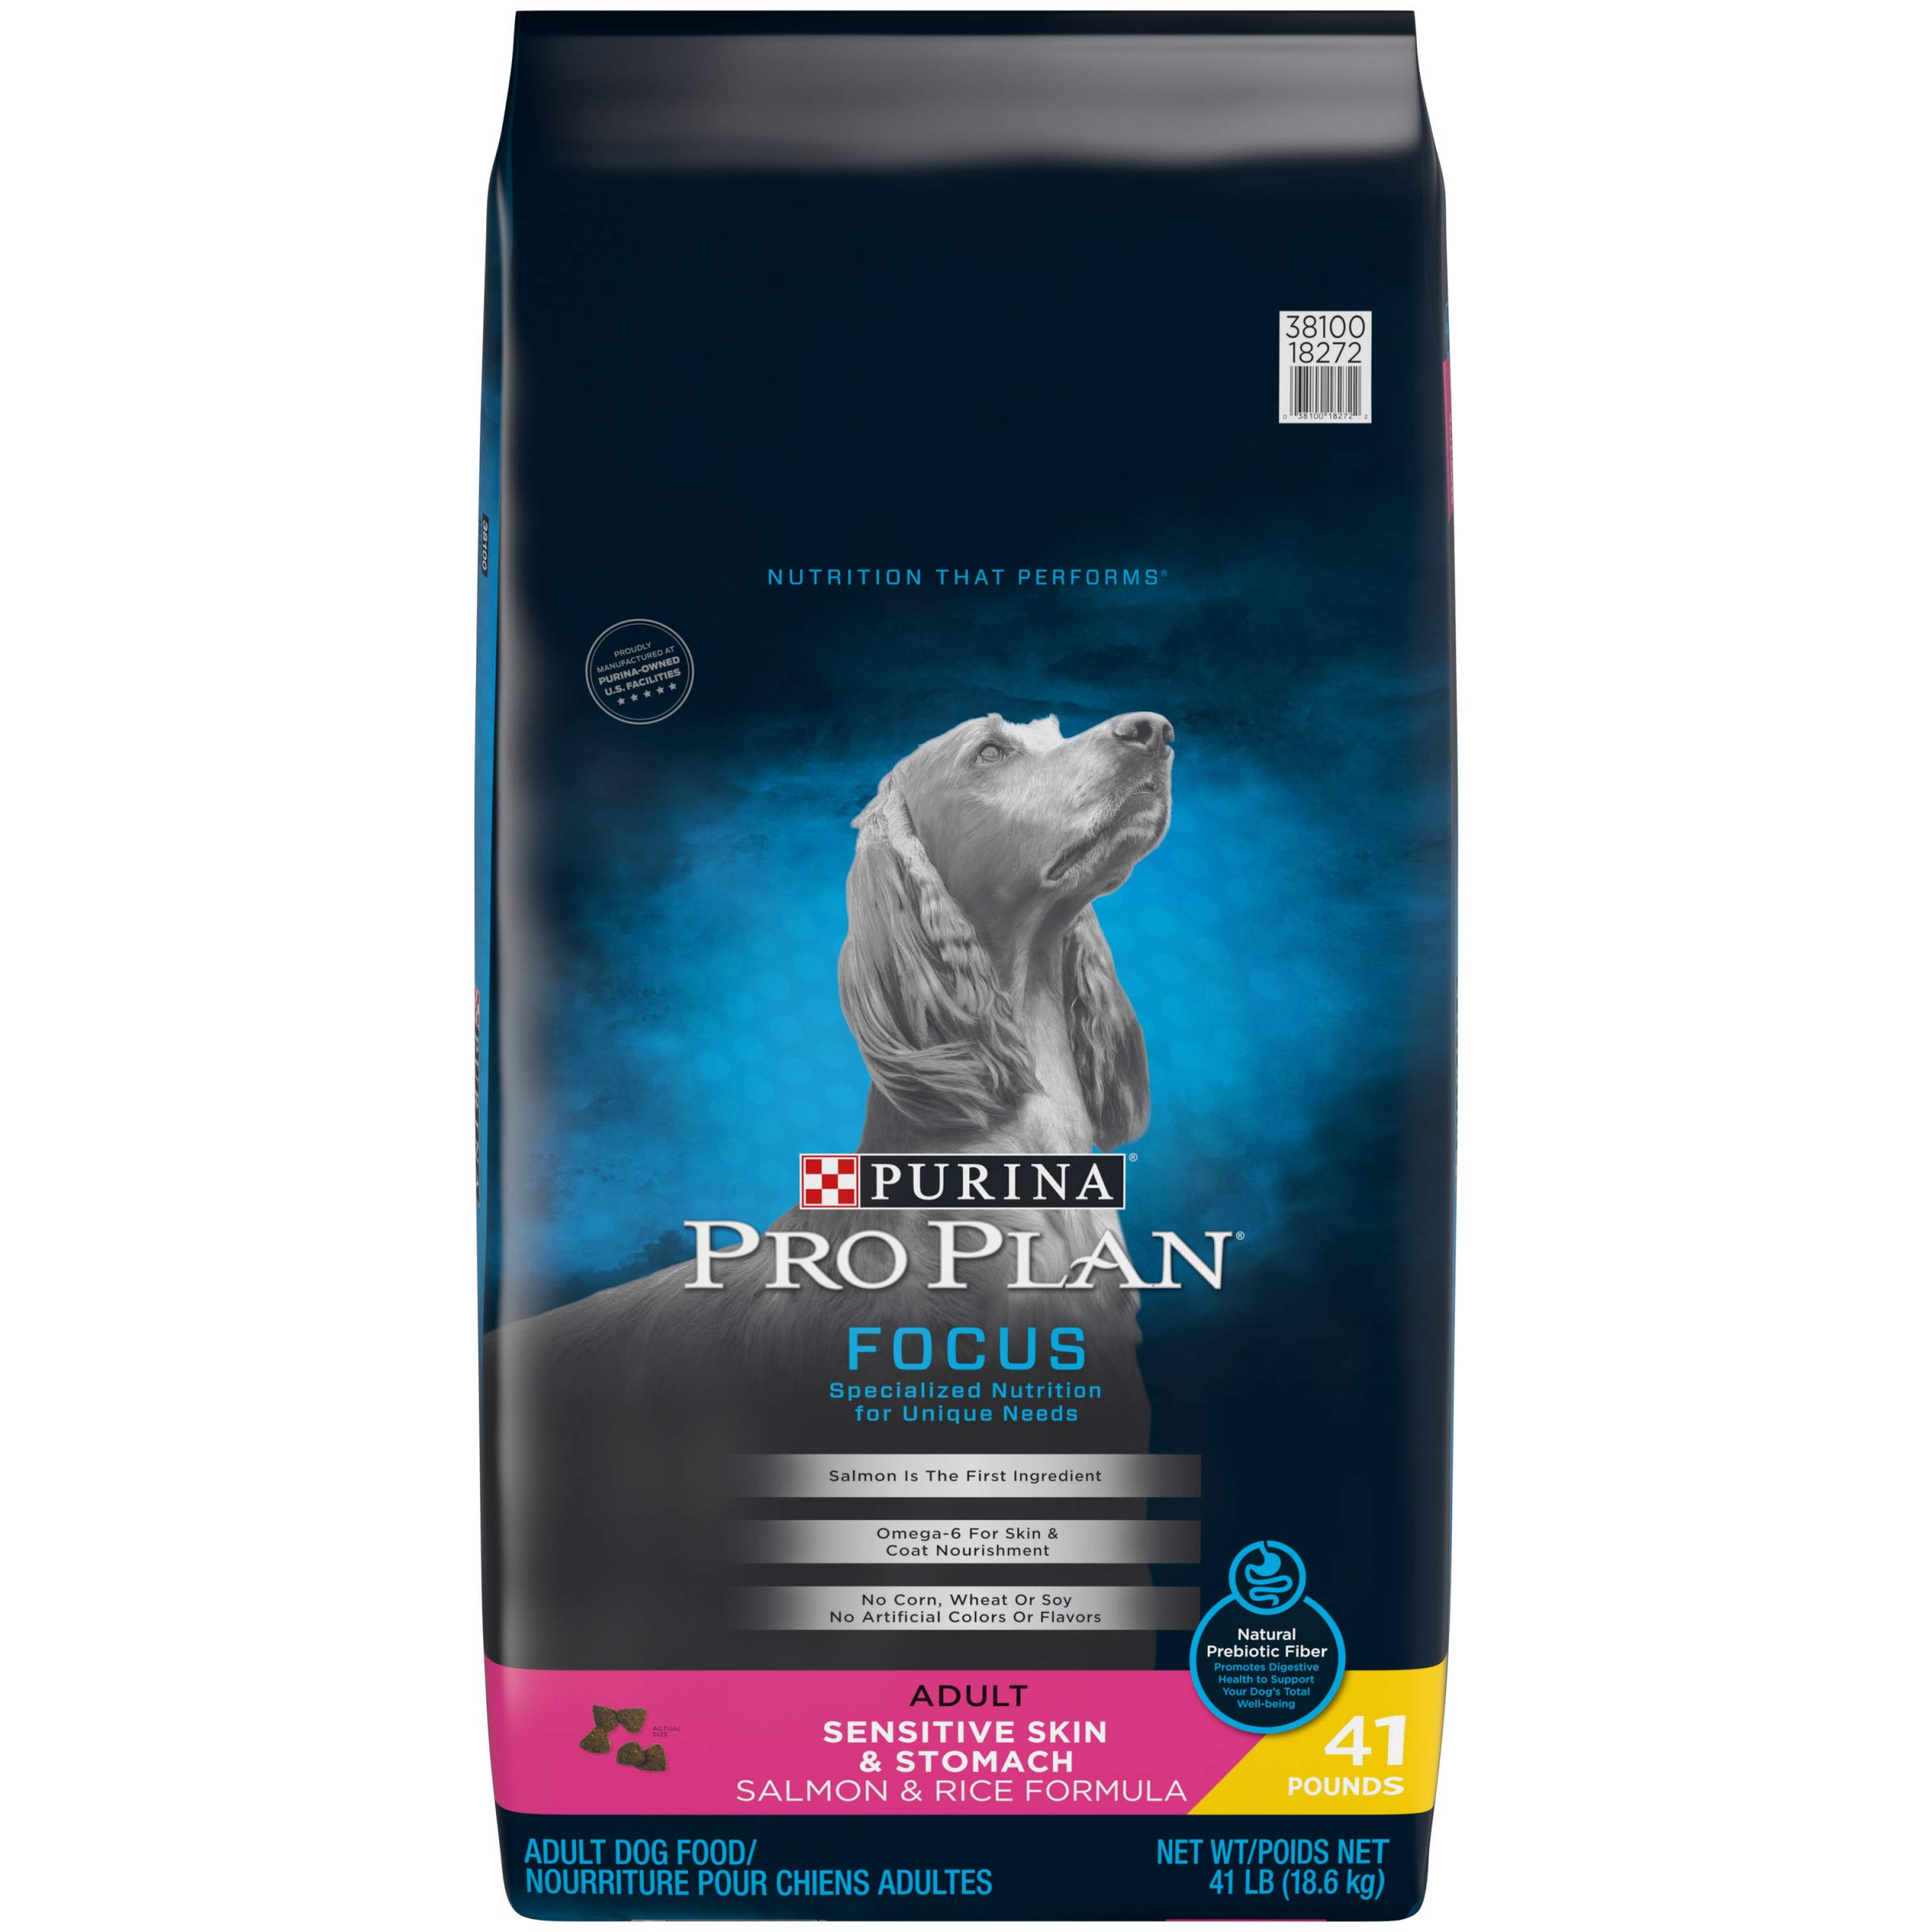 Purina Pro Plan Sensitive Stomach Dry Dog Food; FOCUS Sensitive Skin & Stomach Salmon & Rice Formula - 41 lb. Bag